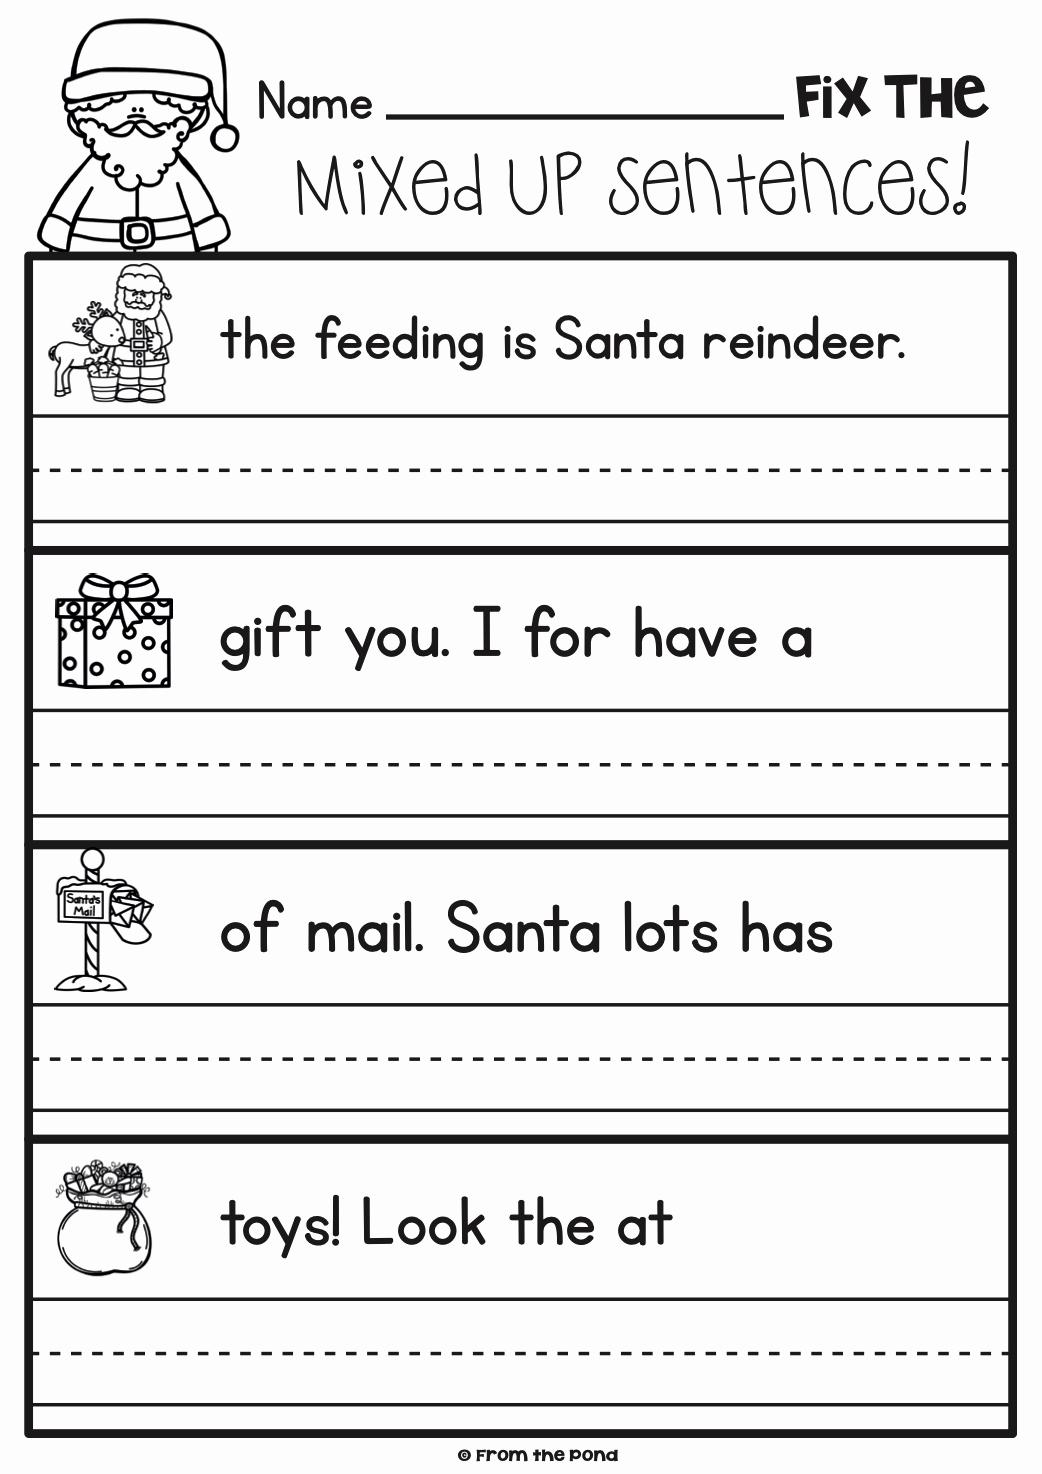 Writing Worksheet 1st Grade Unique Practice Writing Sentences Worksheets for 1st Grade